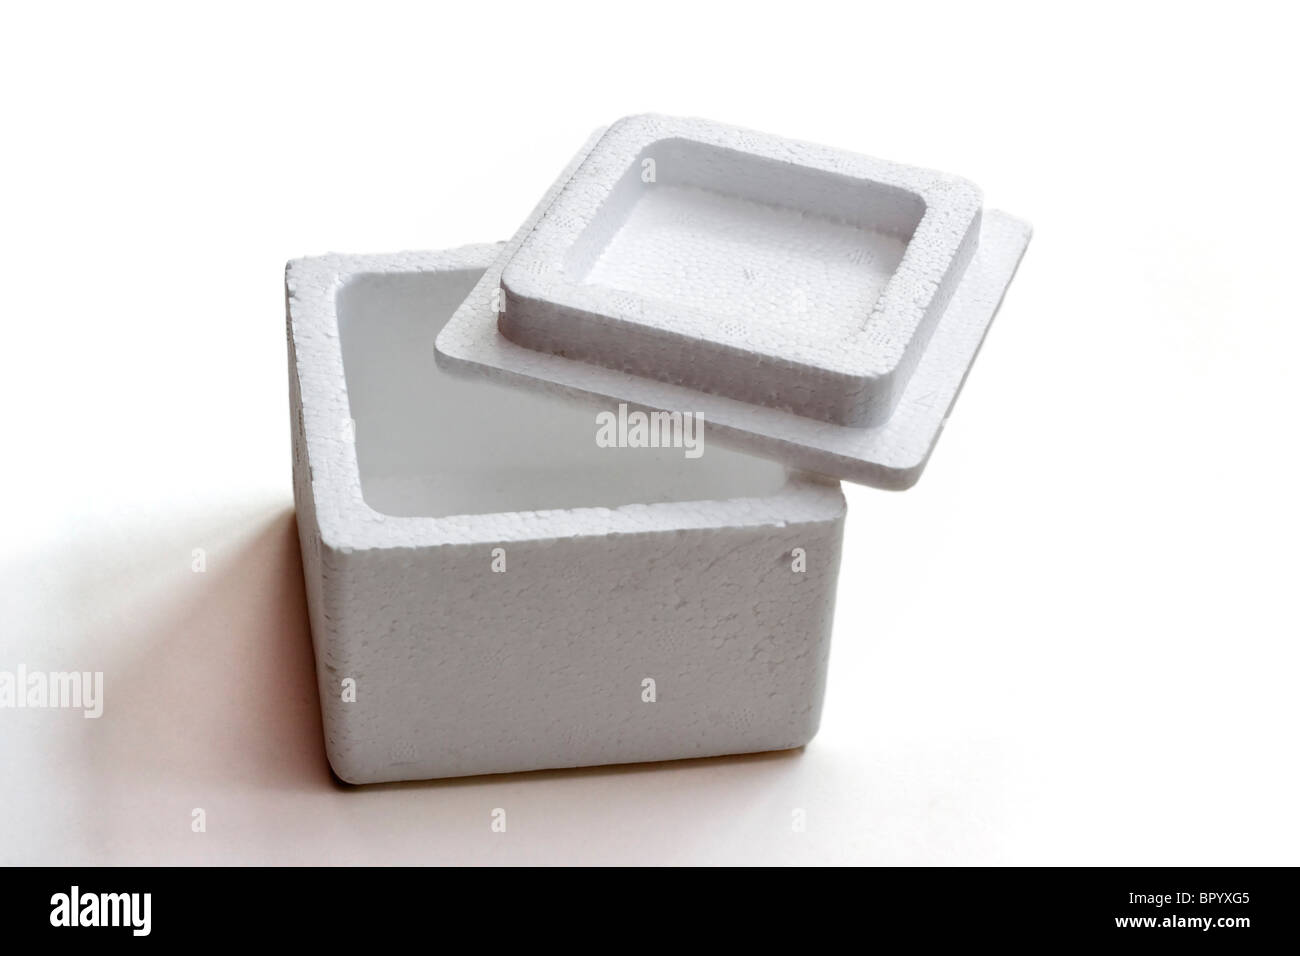 Empty styrofoam box with lid - Stock Image